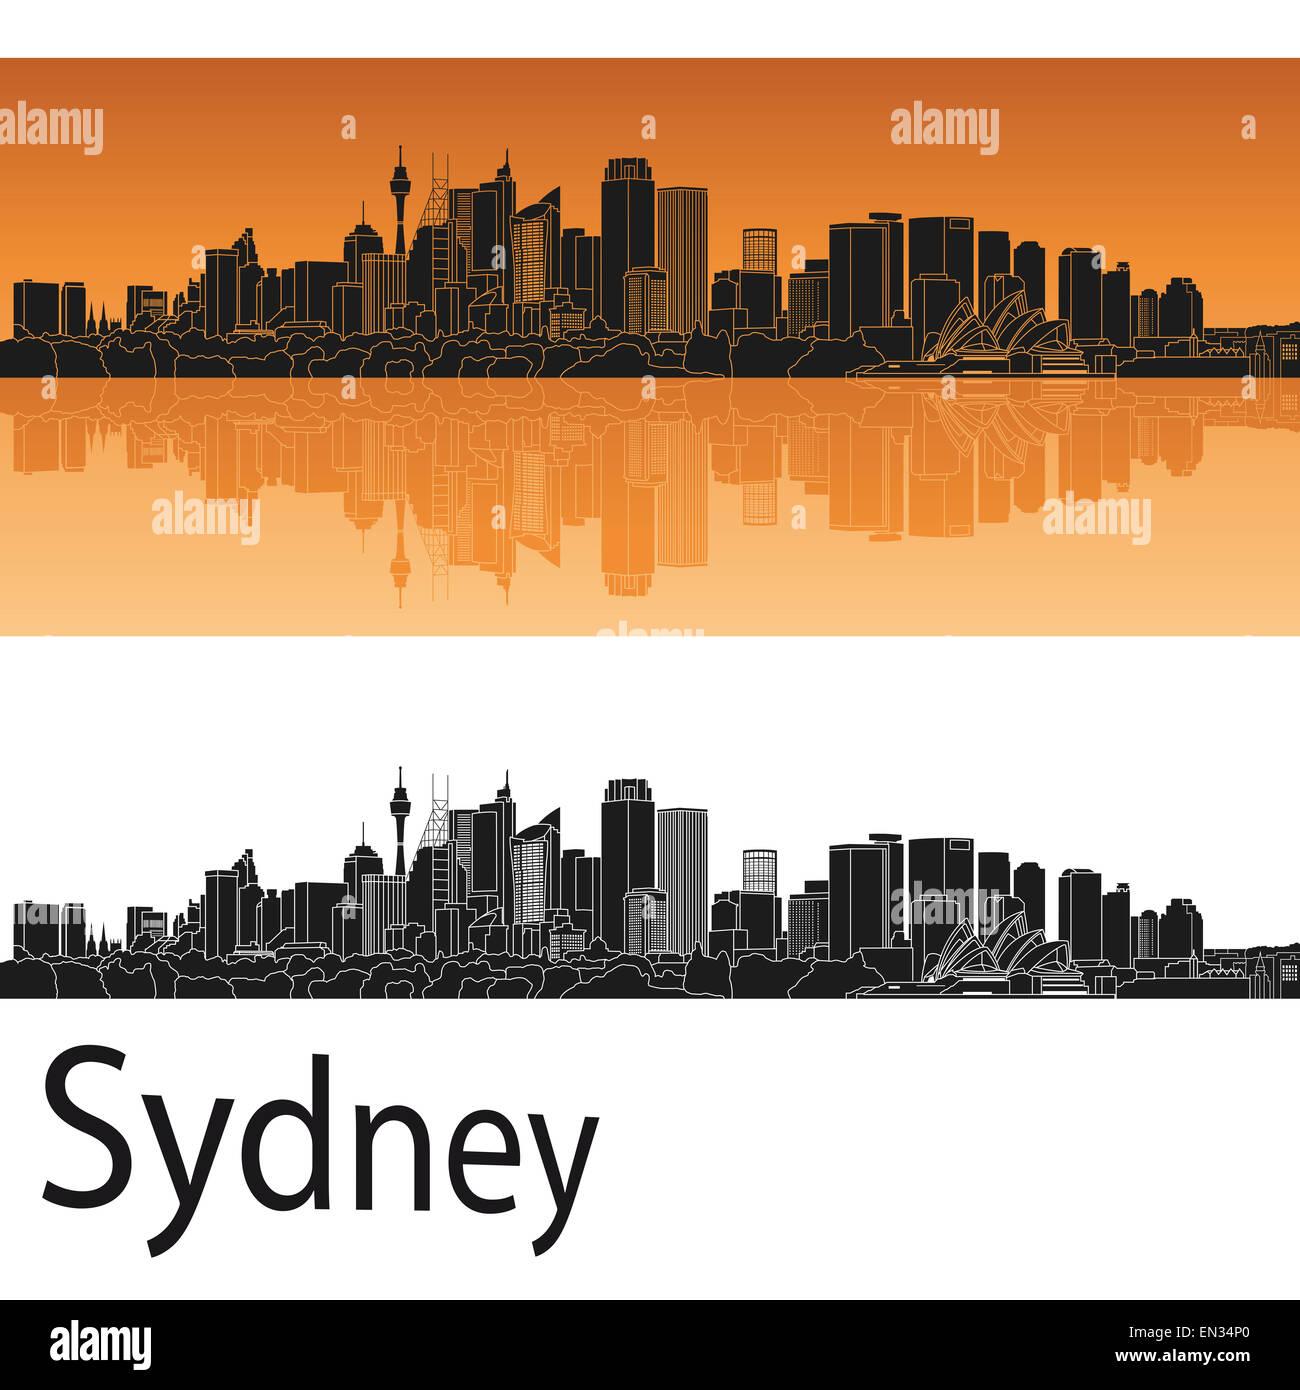 Sydney V2 skyline in orange background in editable vector file - Stock Image